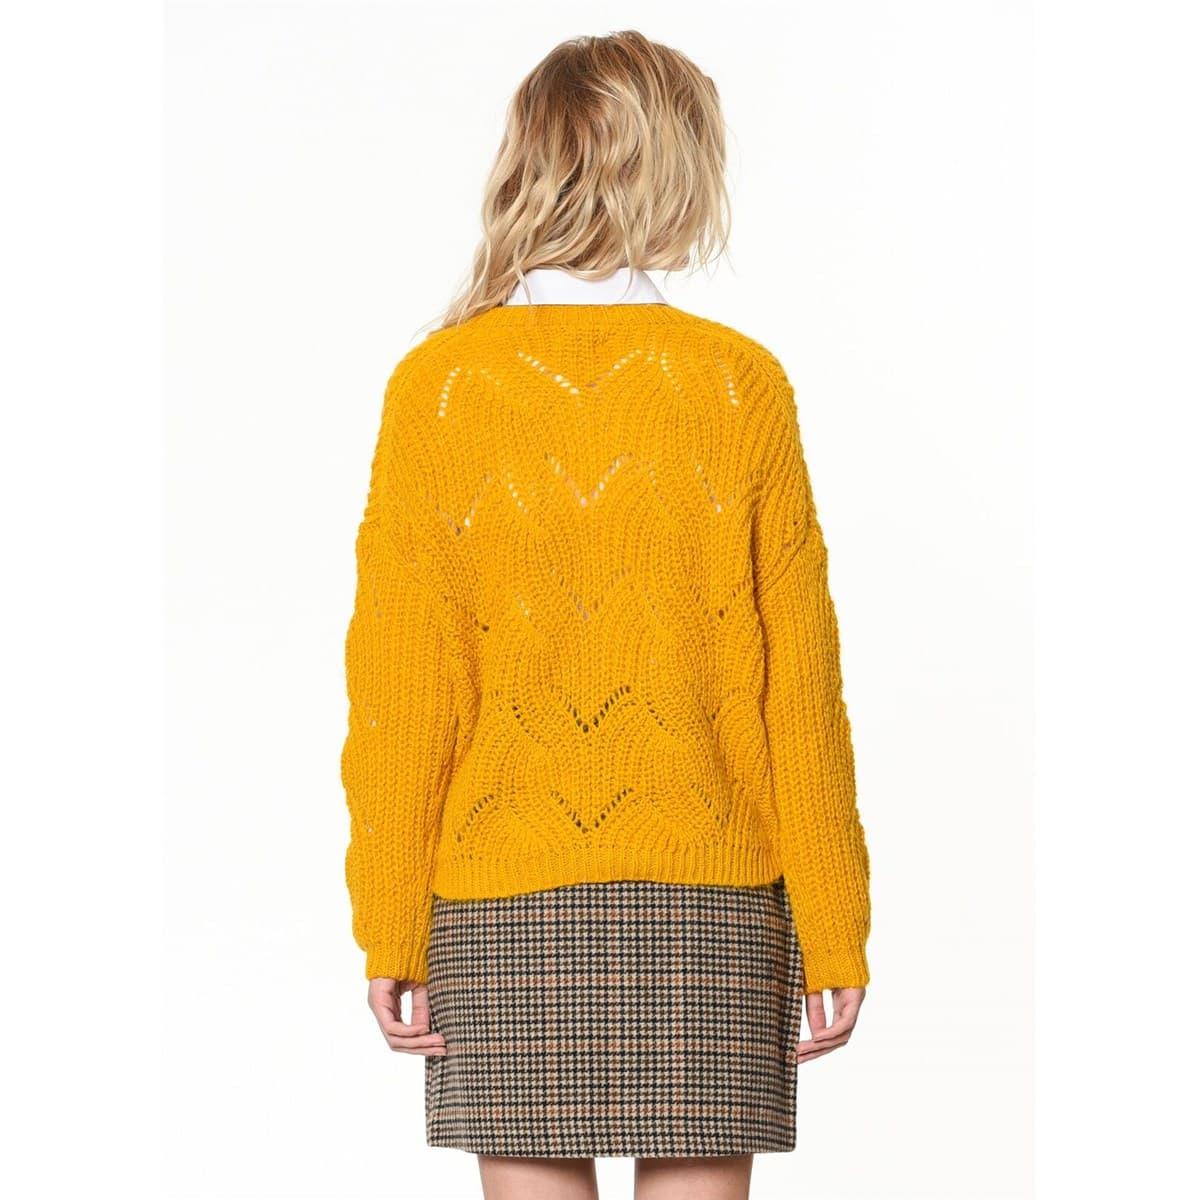 Onlhavana L/s Pullover Knt Noos